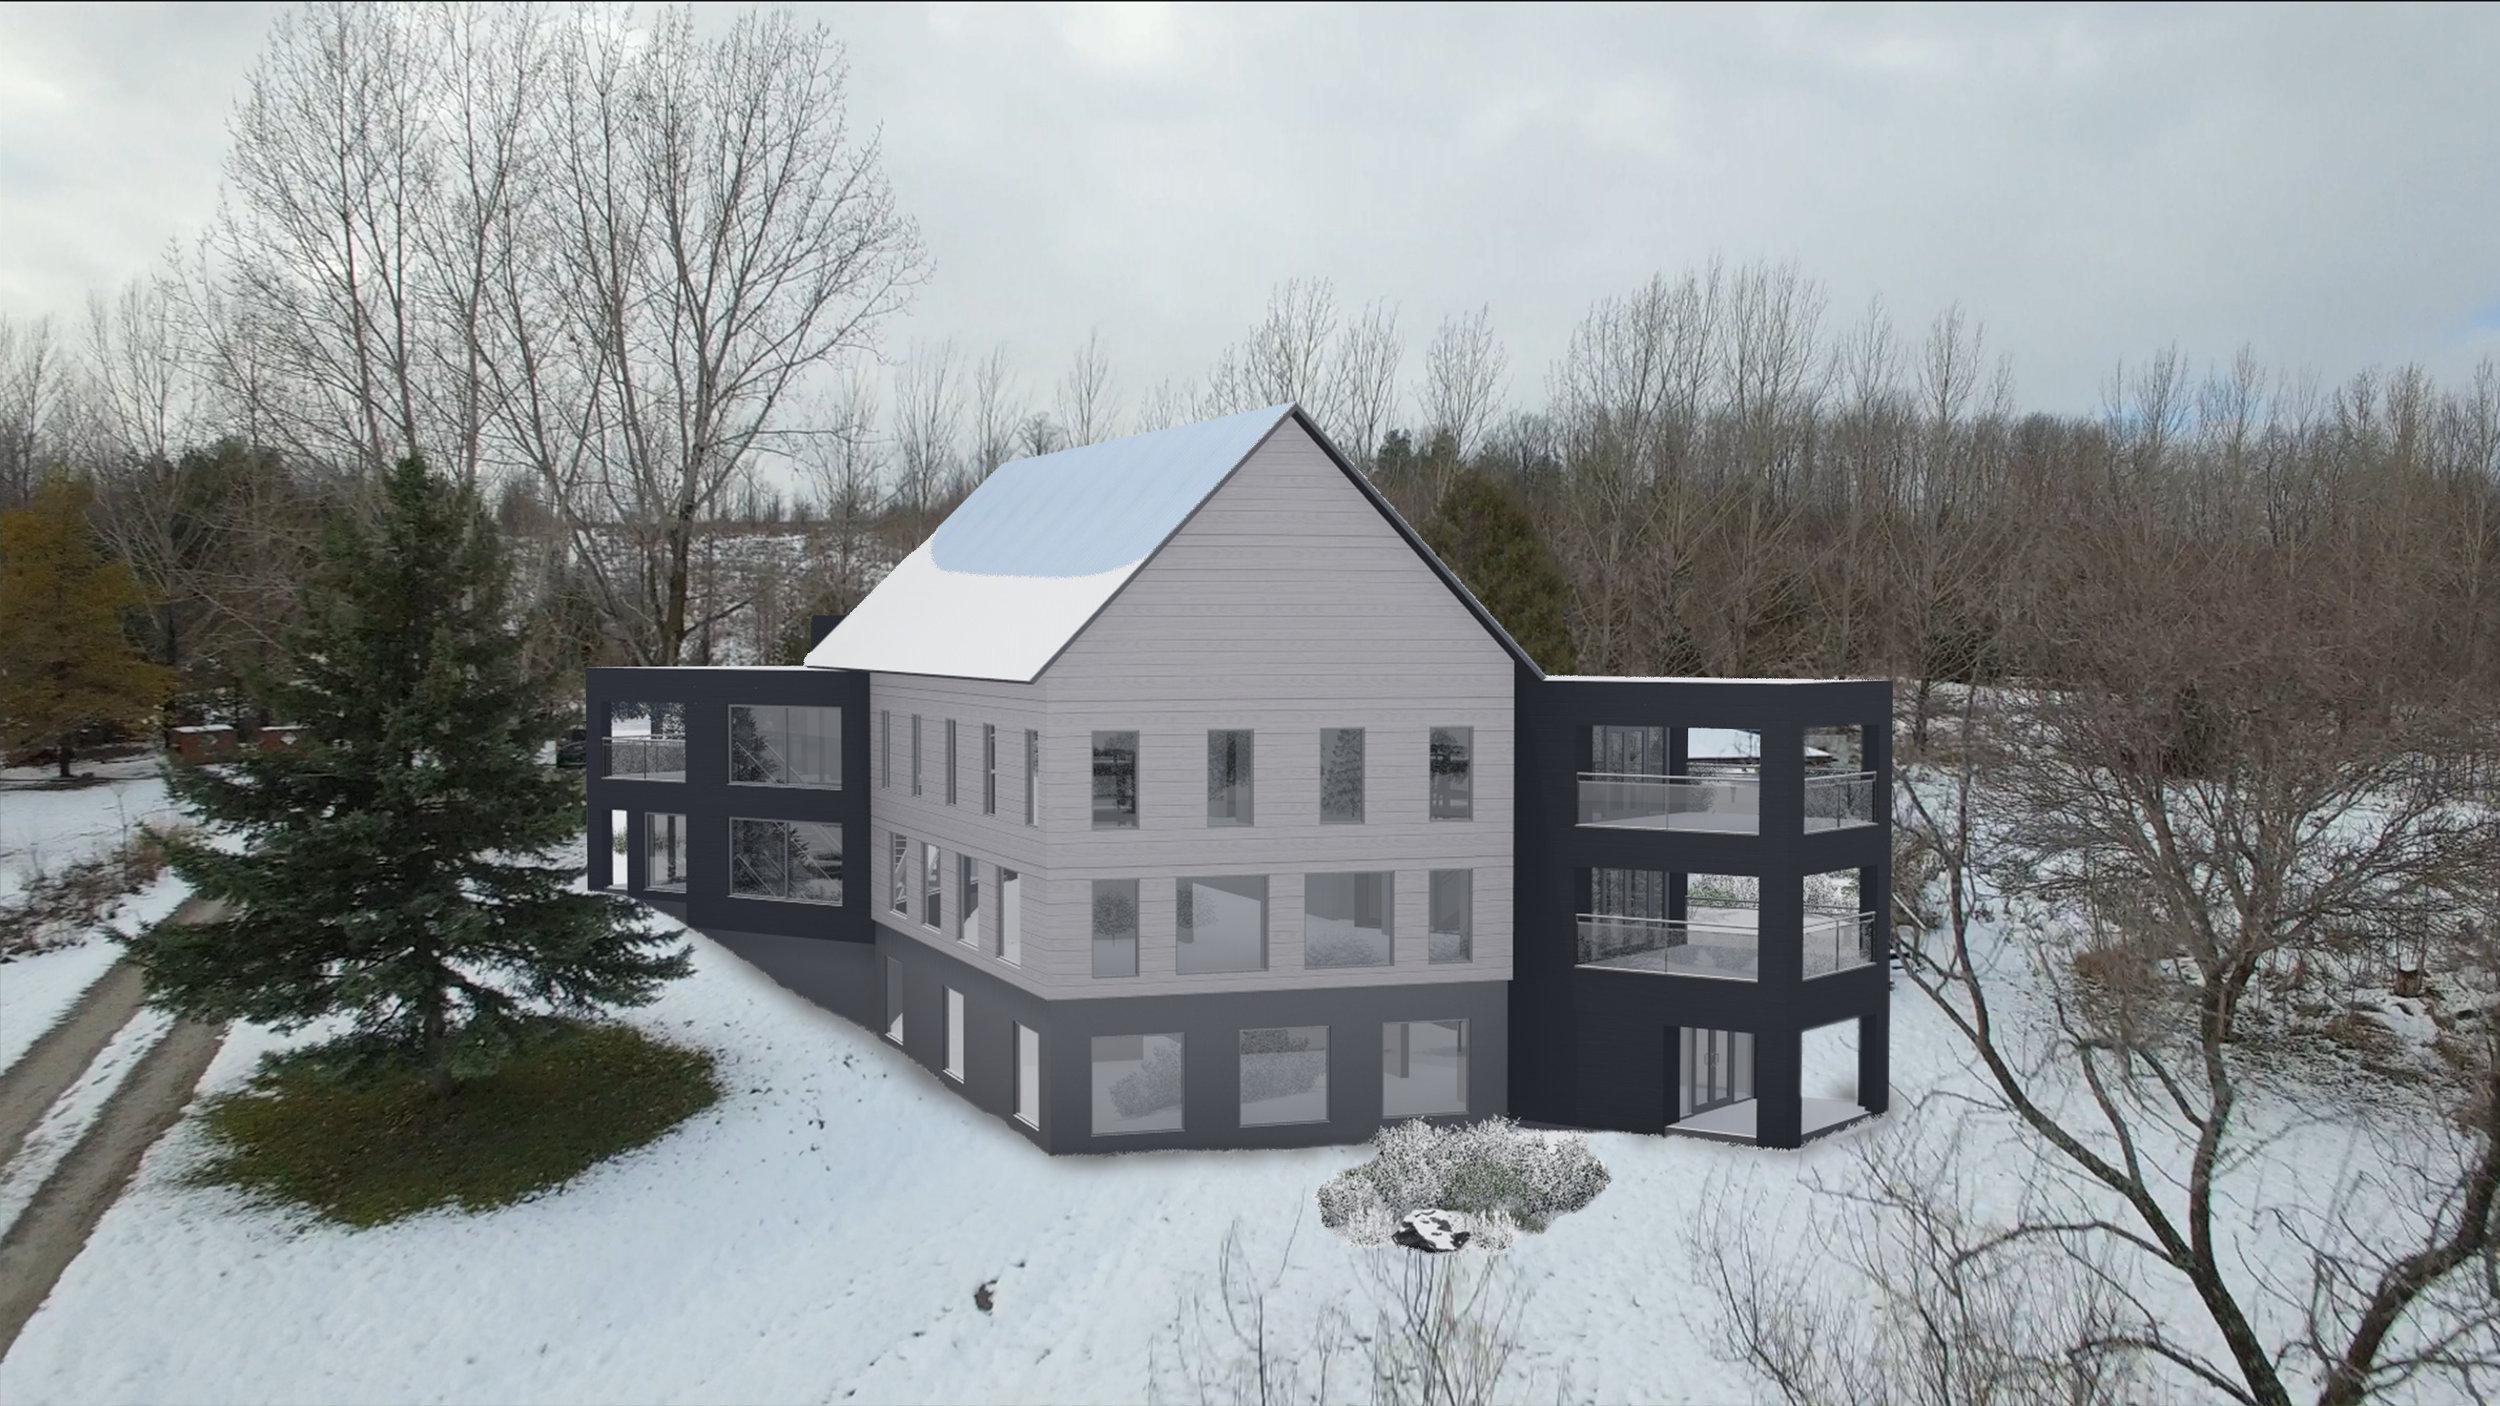 Kimbercote Accommodations Building - 011B2.jpg